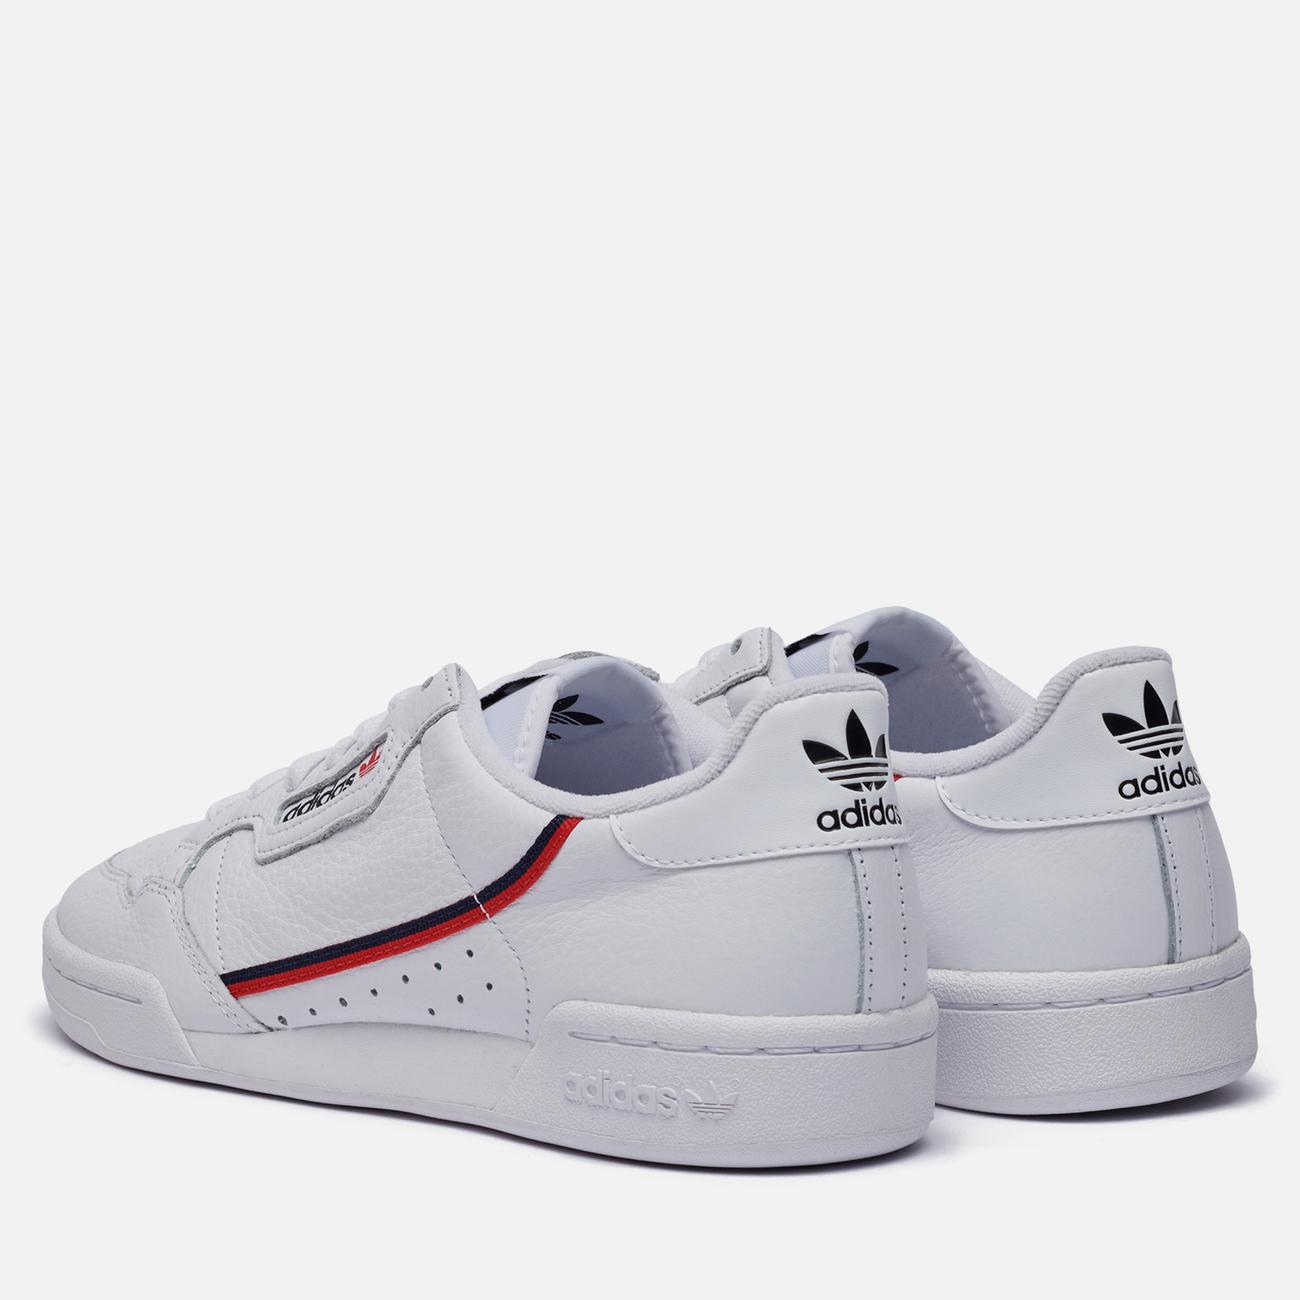 Кроссовки adidas Originals Continental 80 Cloud White/Scarlet/Collegiate Navy